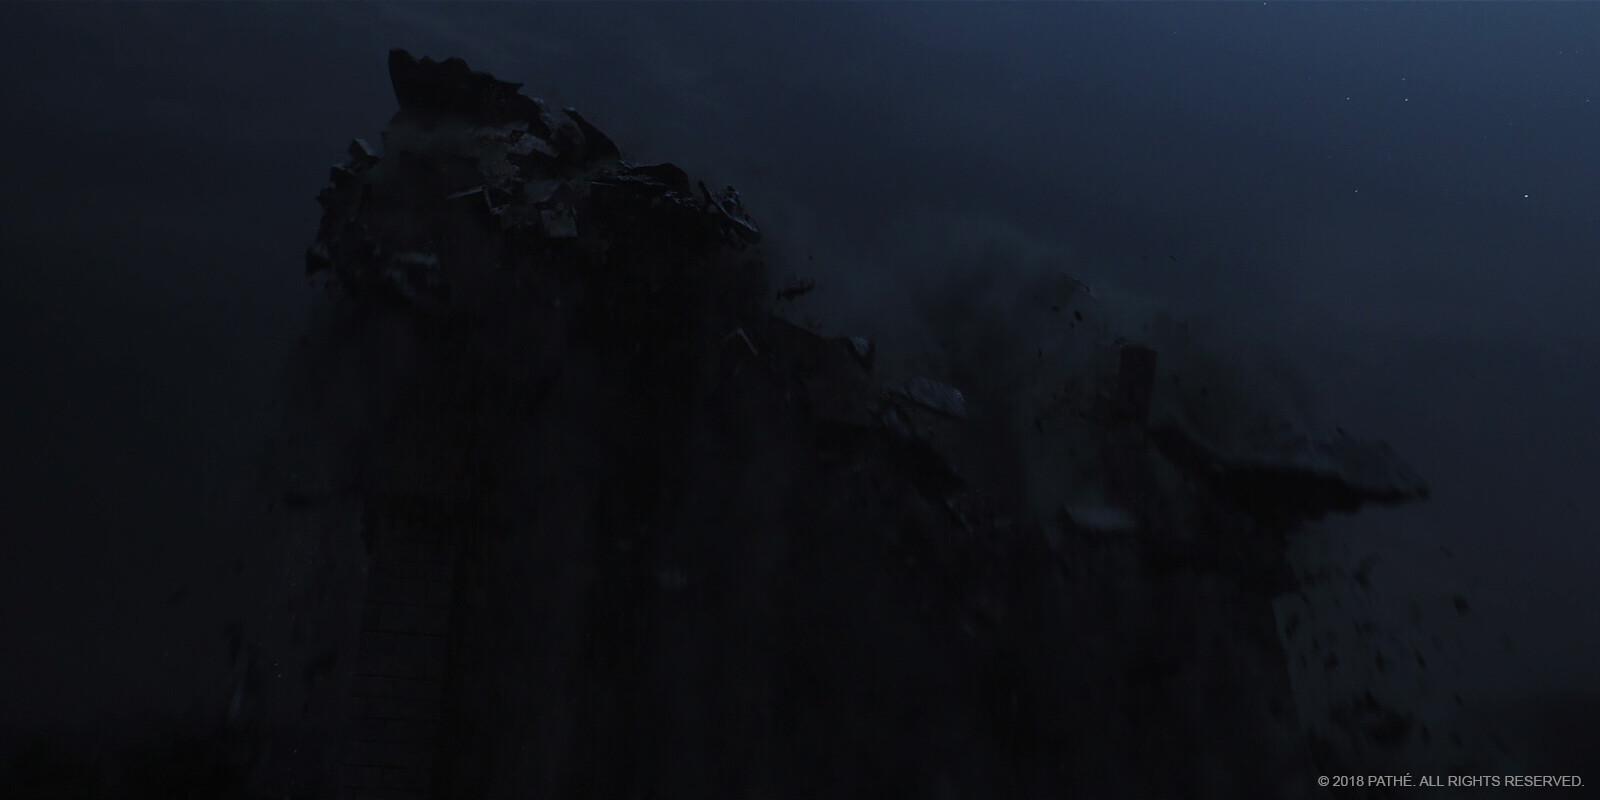 L'Aquila earthquake - texturing, shading, lighting